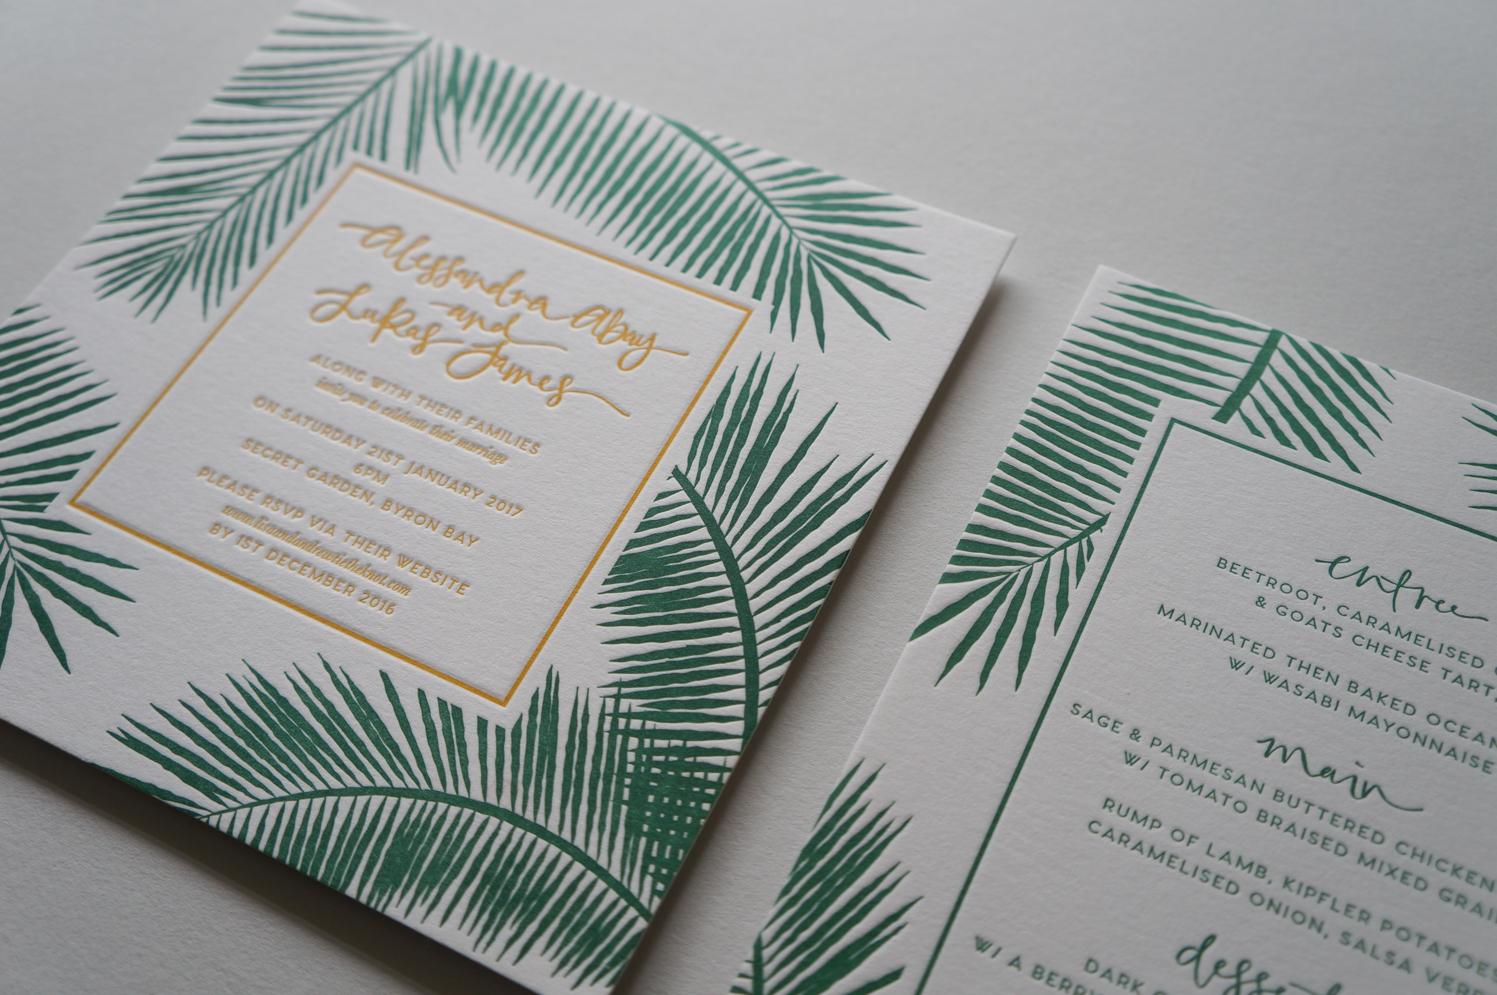 letterpress-invitations-byron-bay-foliage-green-palm-leaves-8